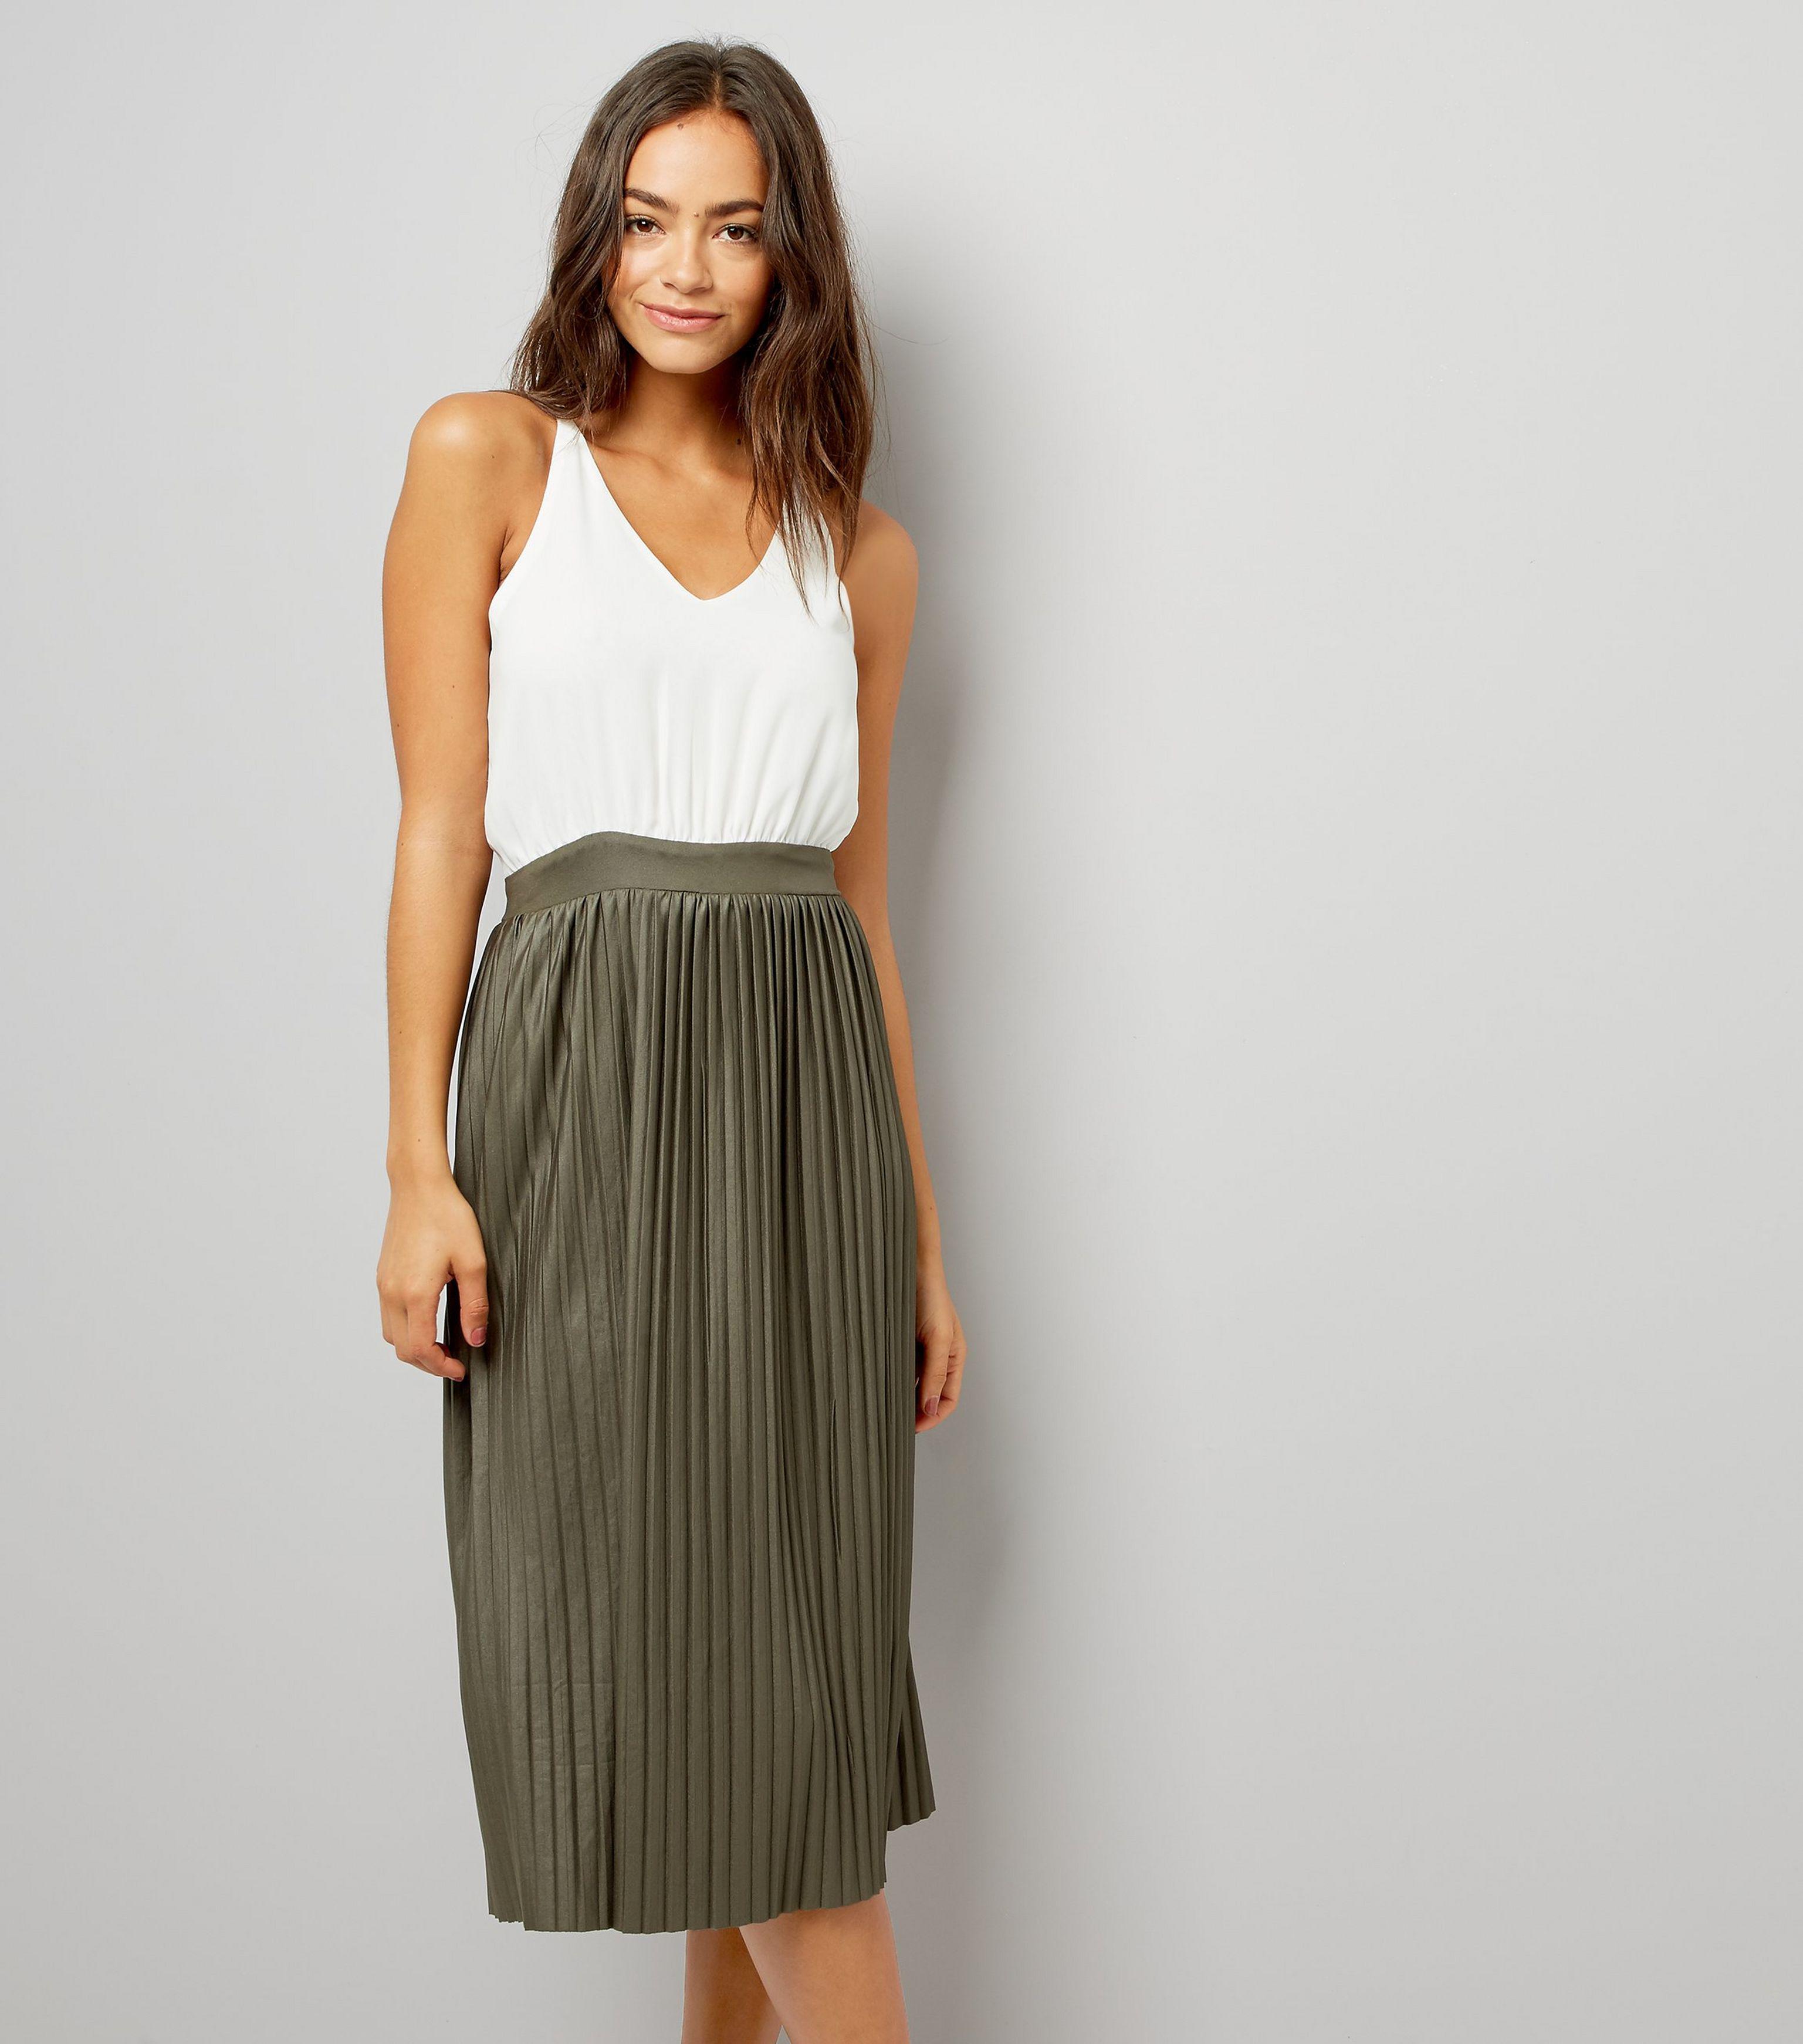 7be8ea353d AX Paris Khaki Pleated Skirt Dress in Natural - Lyst